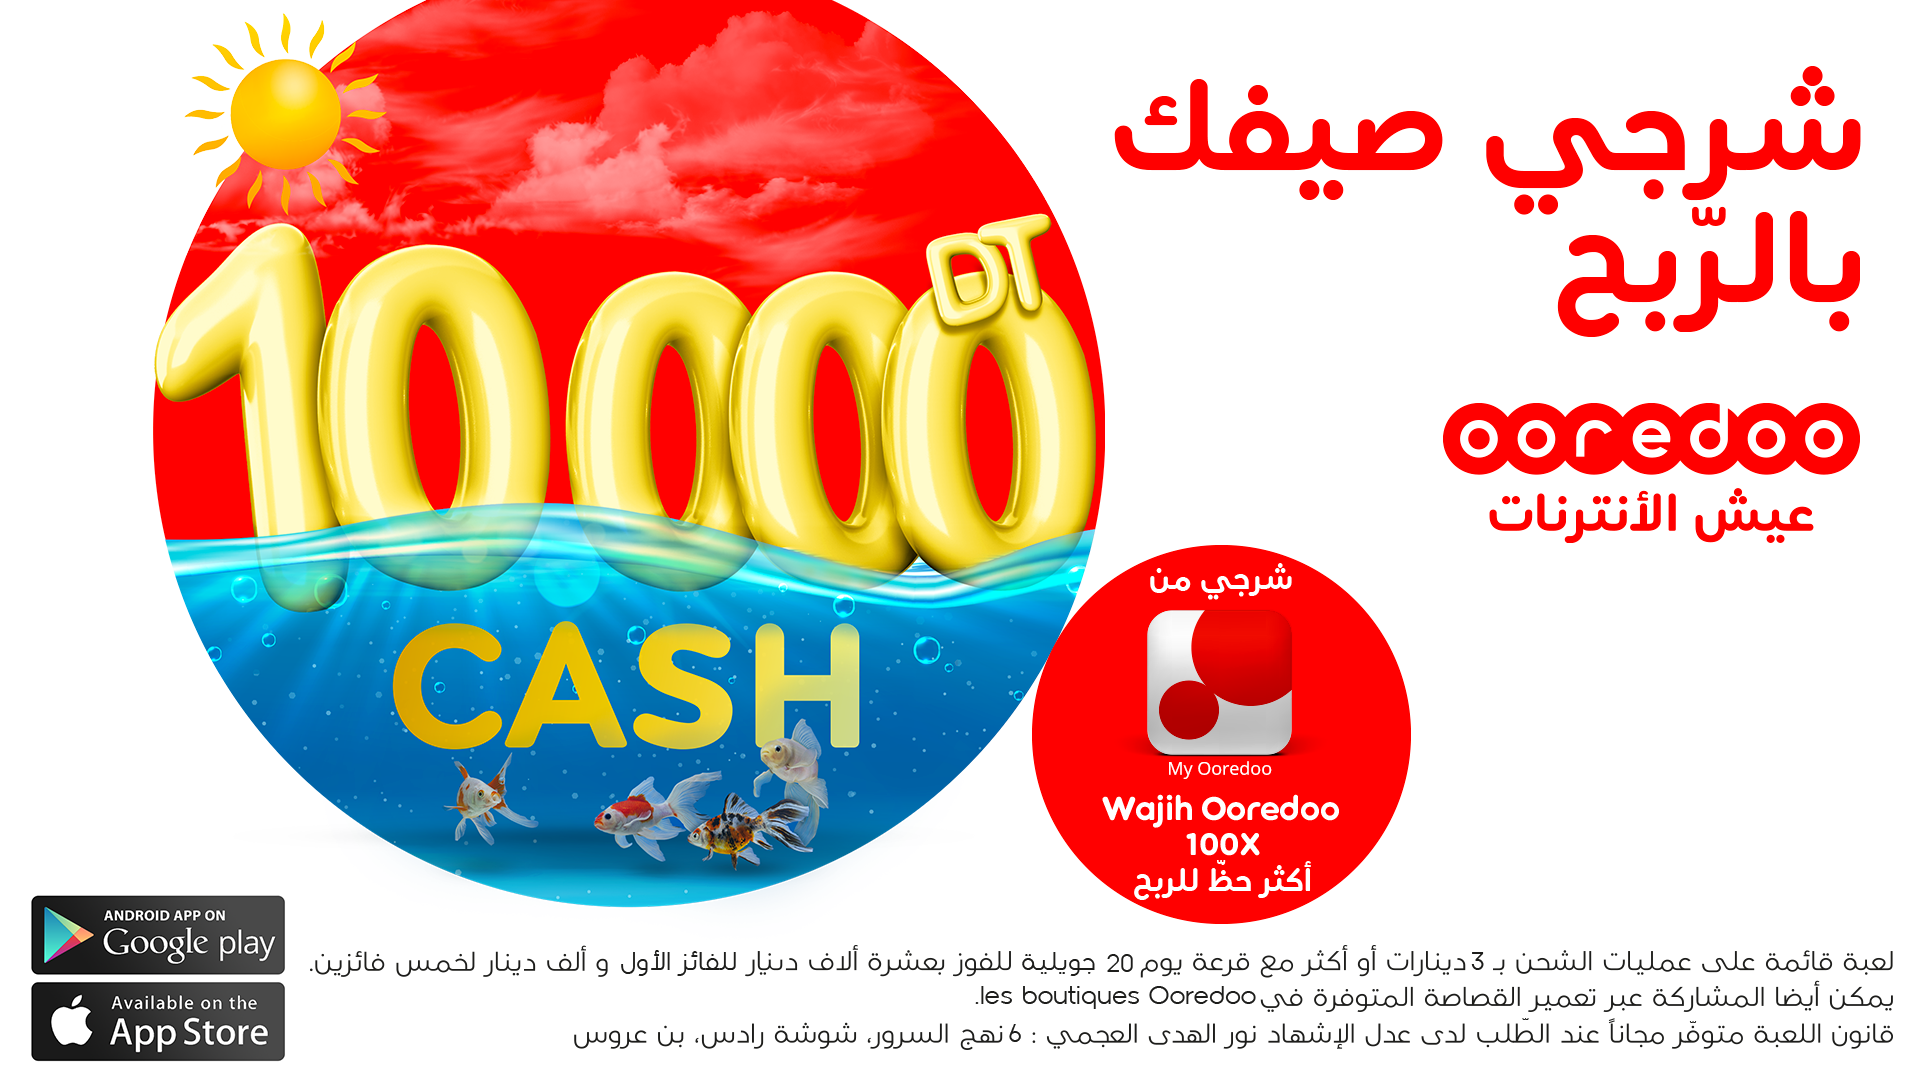 شرجي واربح مع Ooredoo تعود بجوائز تصل الى 10.000 دينار: